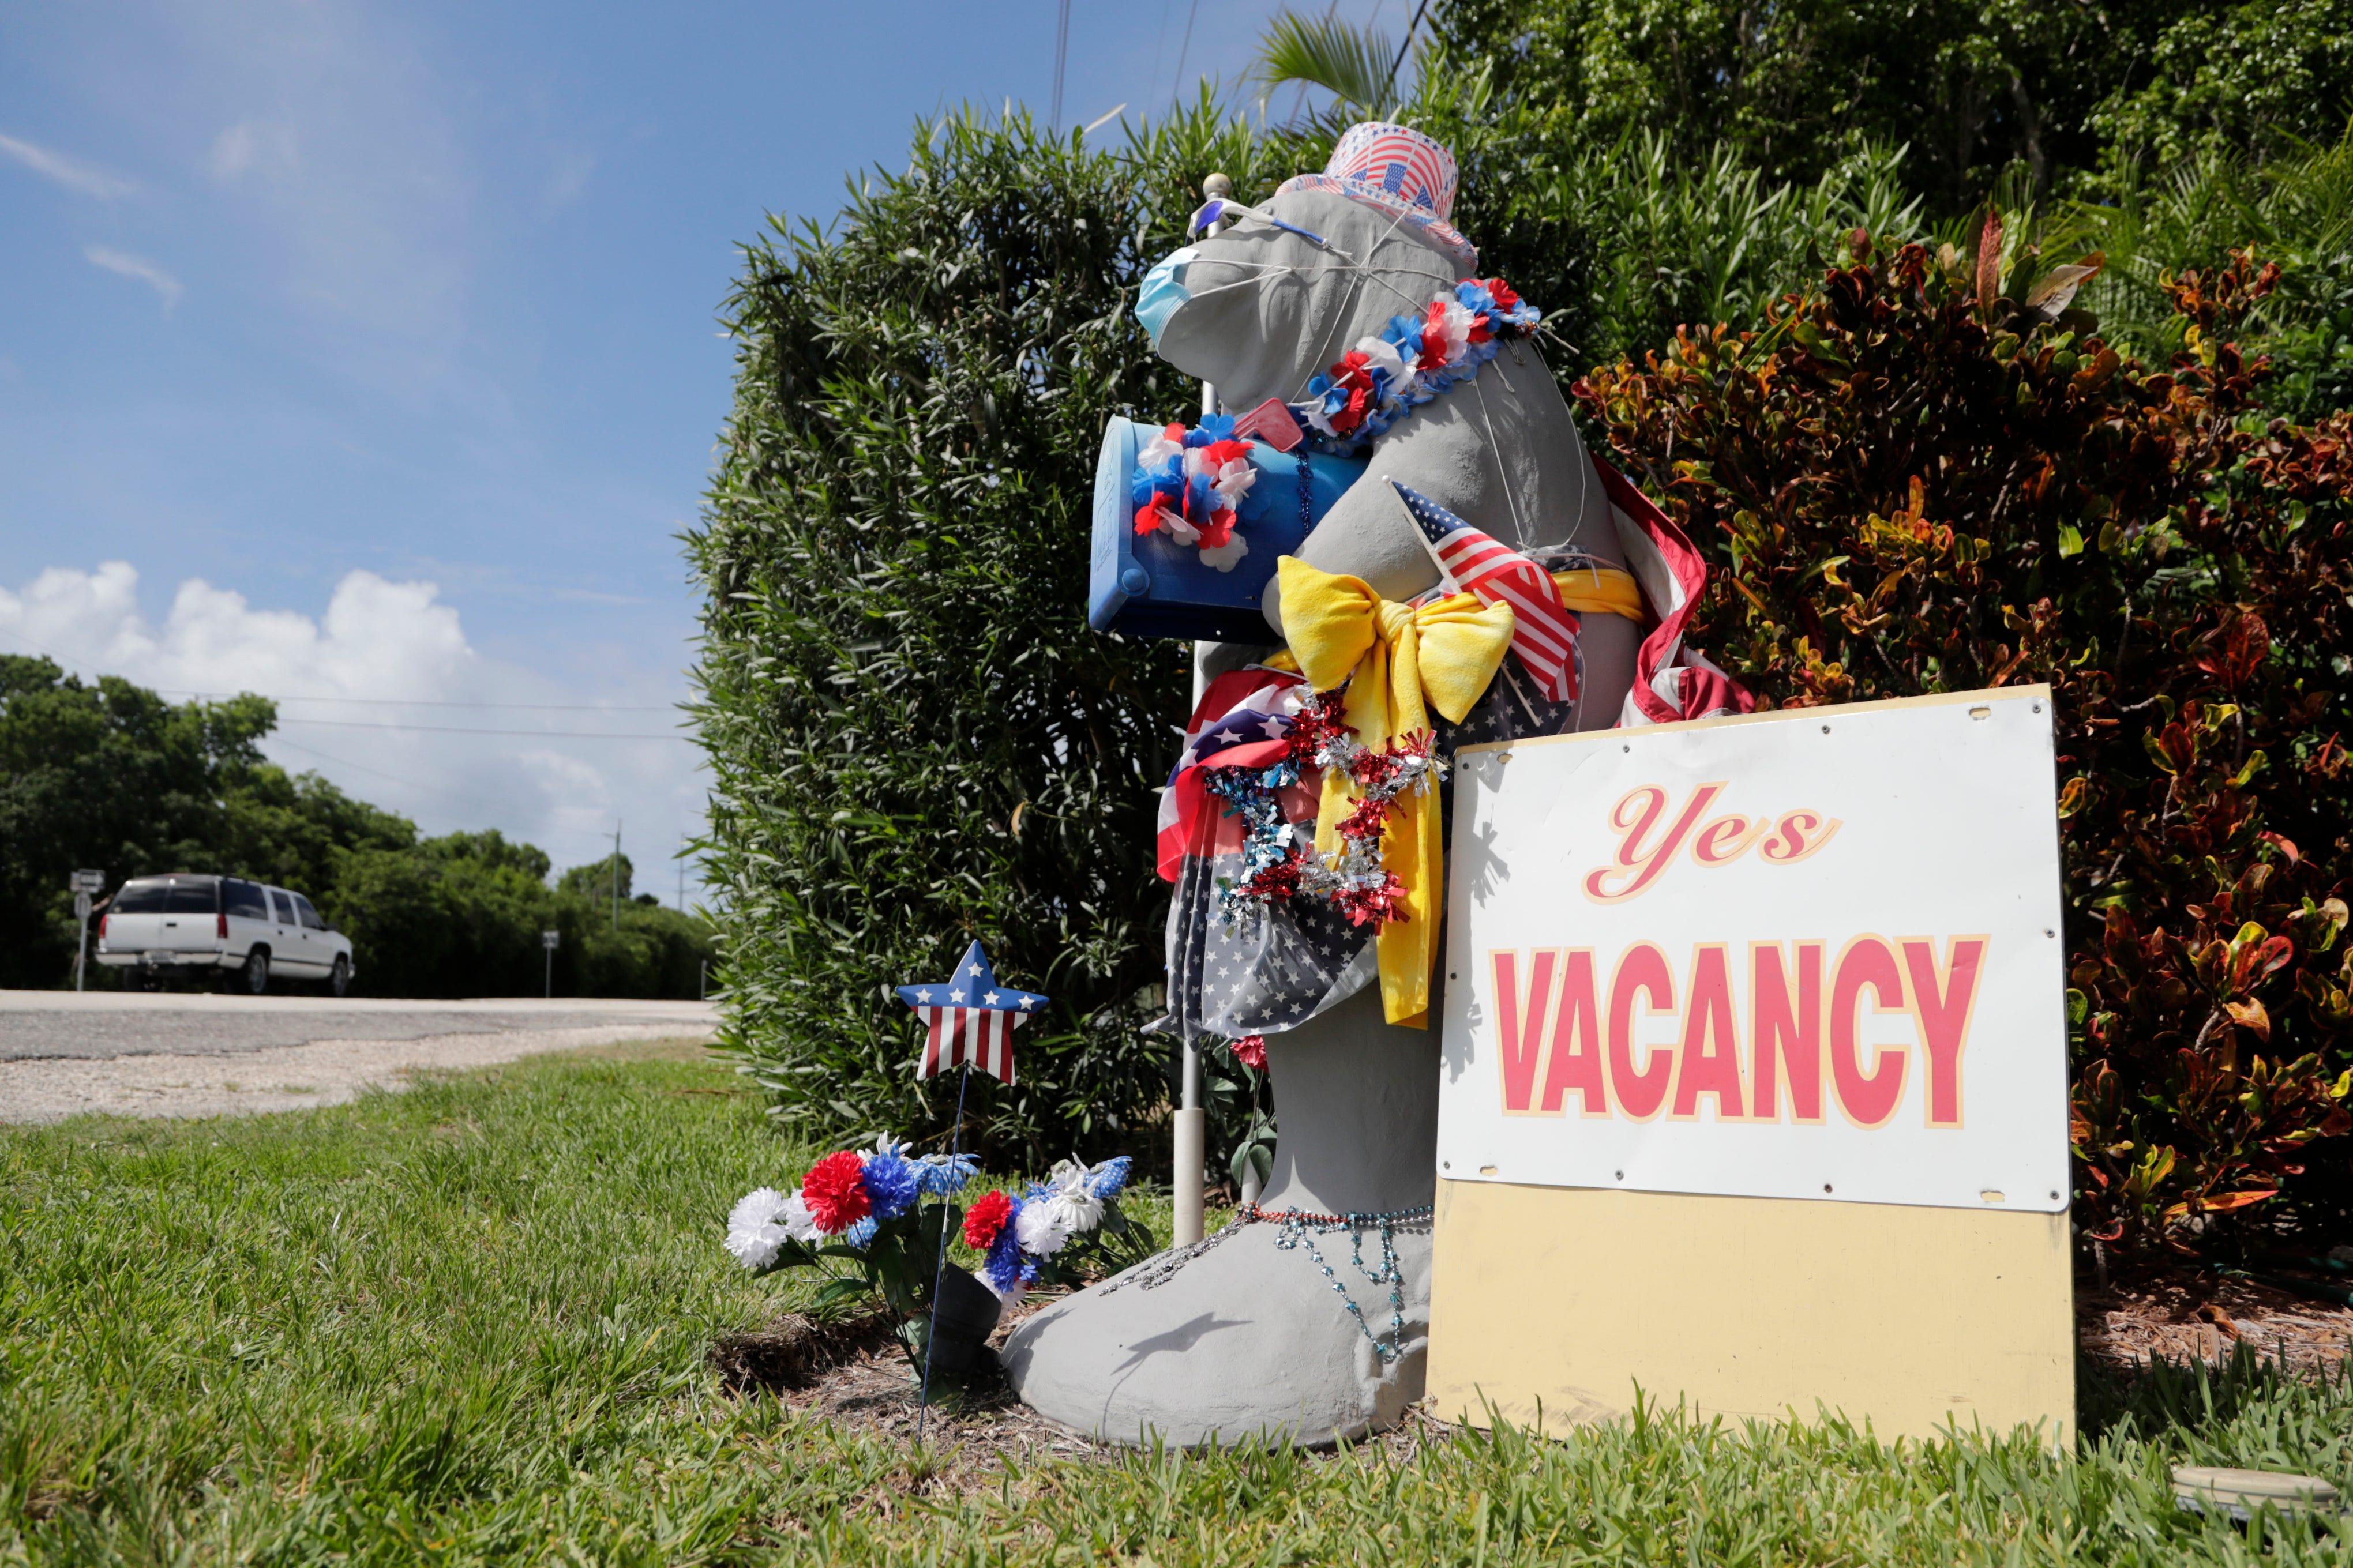 Florida Keys Reopen After Covid 19 Shutdown Miami Area Beaches Closed